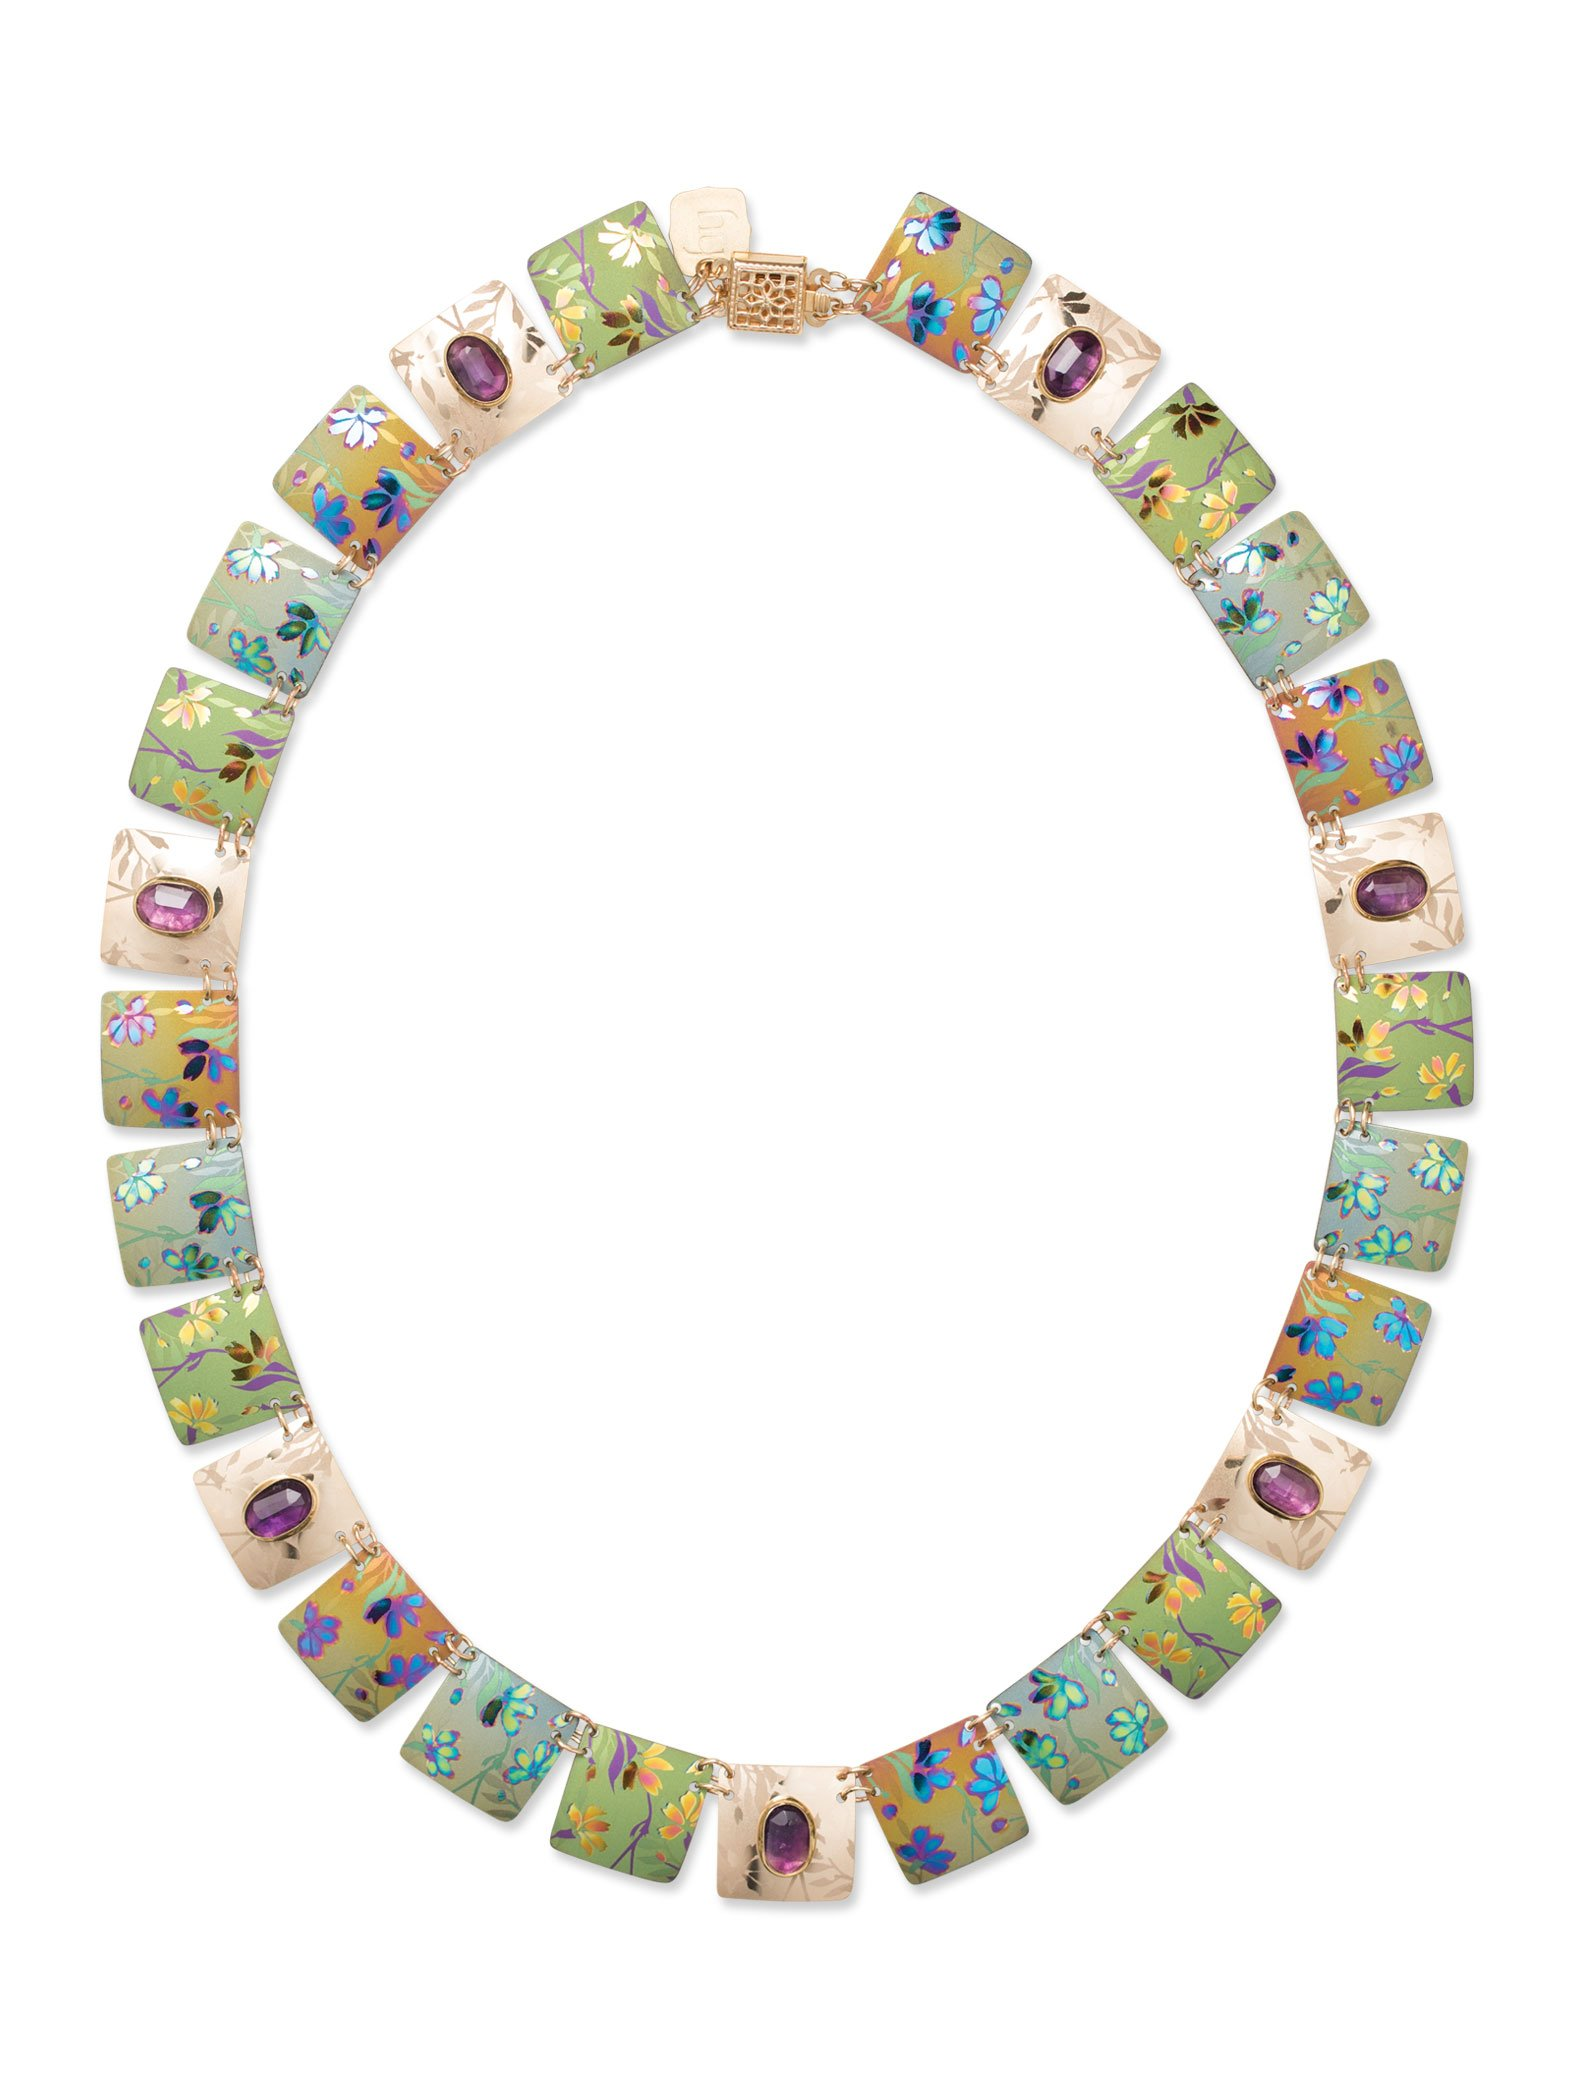 Holly Yashi Garden Sonnet Collar Necklace, Made in California (Amethyst/Multi)